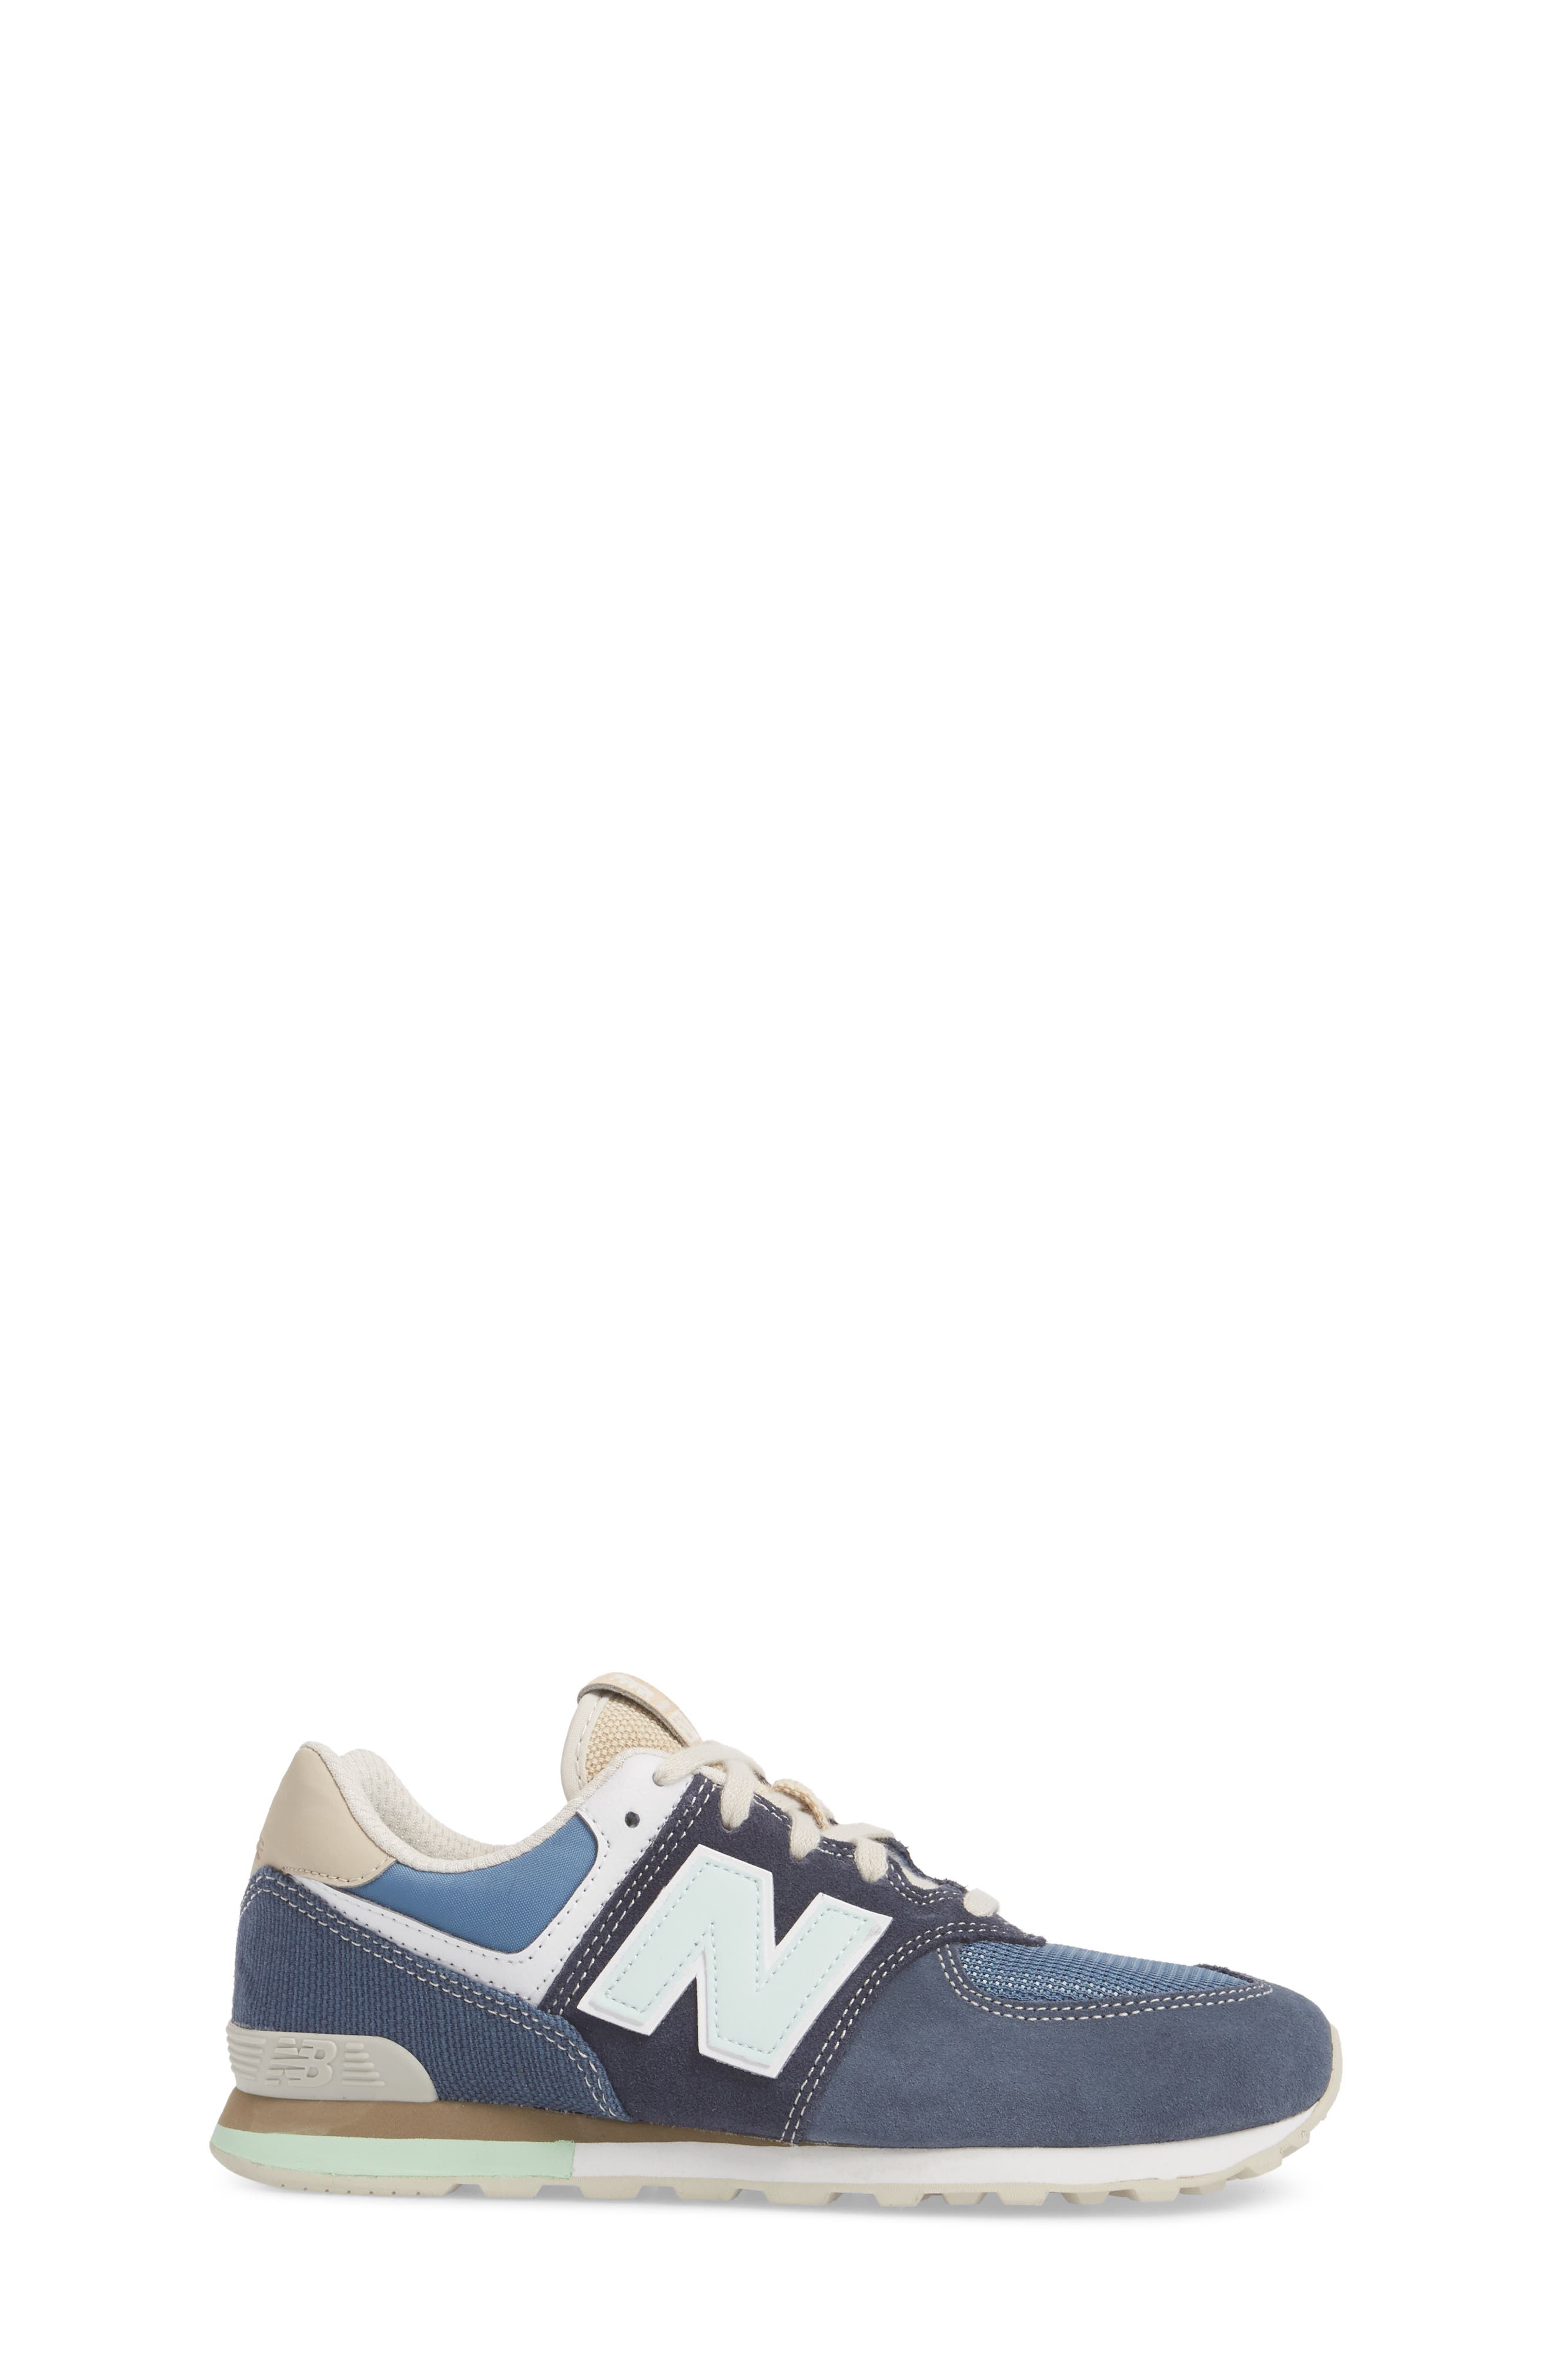 574 Retro Surf Sneaker,                             Alternate thumbnail 3, color,